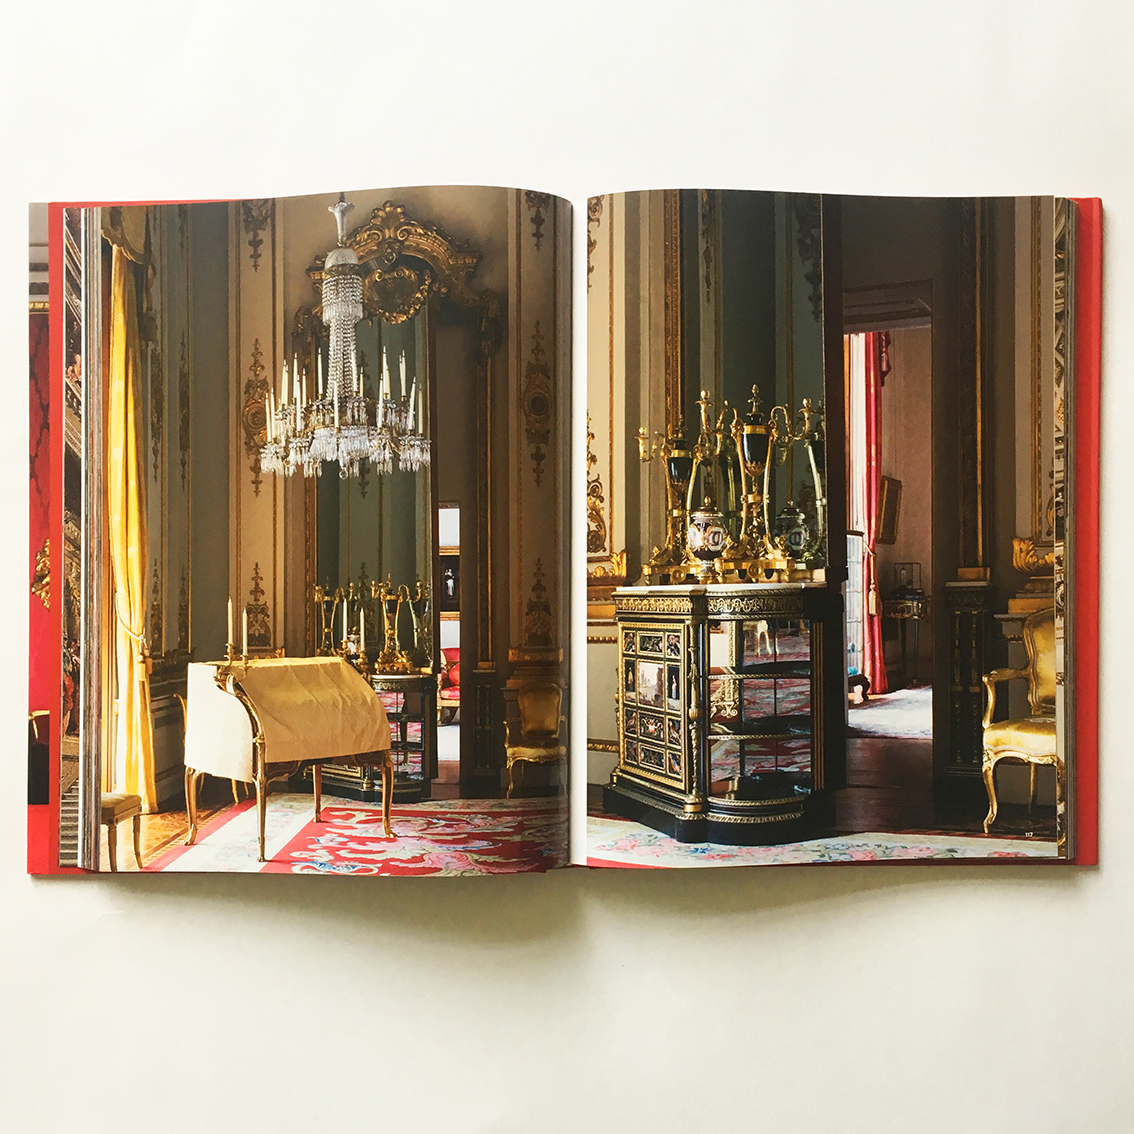 Buckingham_Palace_Ashley_Hicks_95.jpg